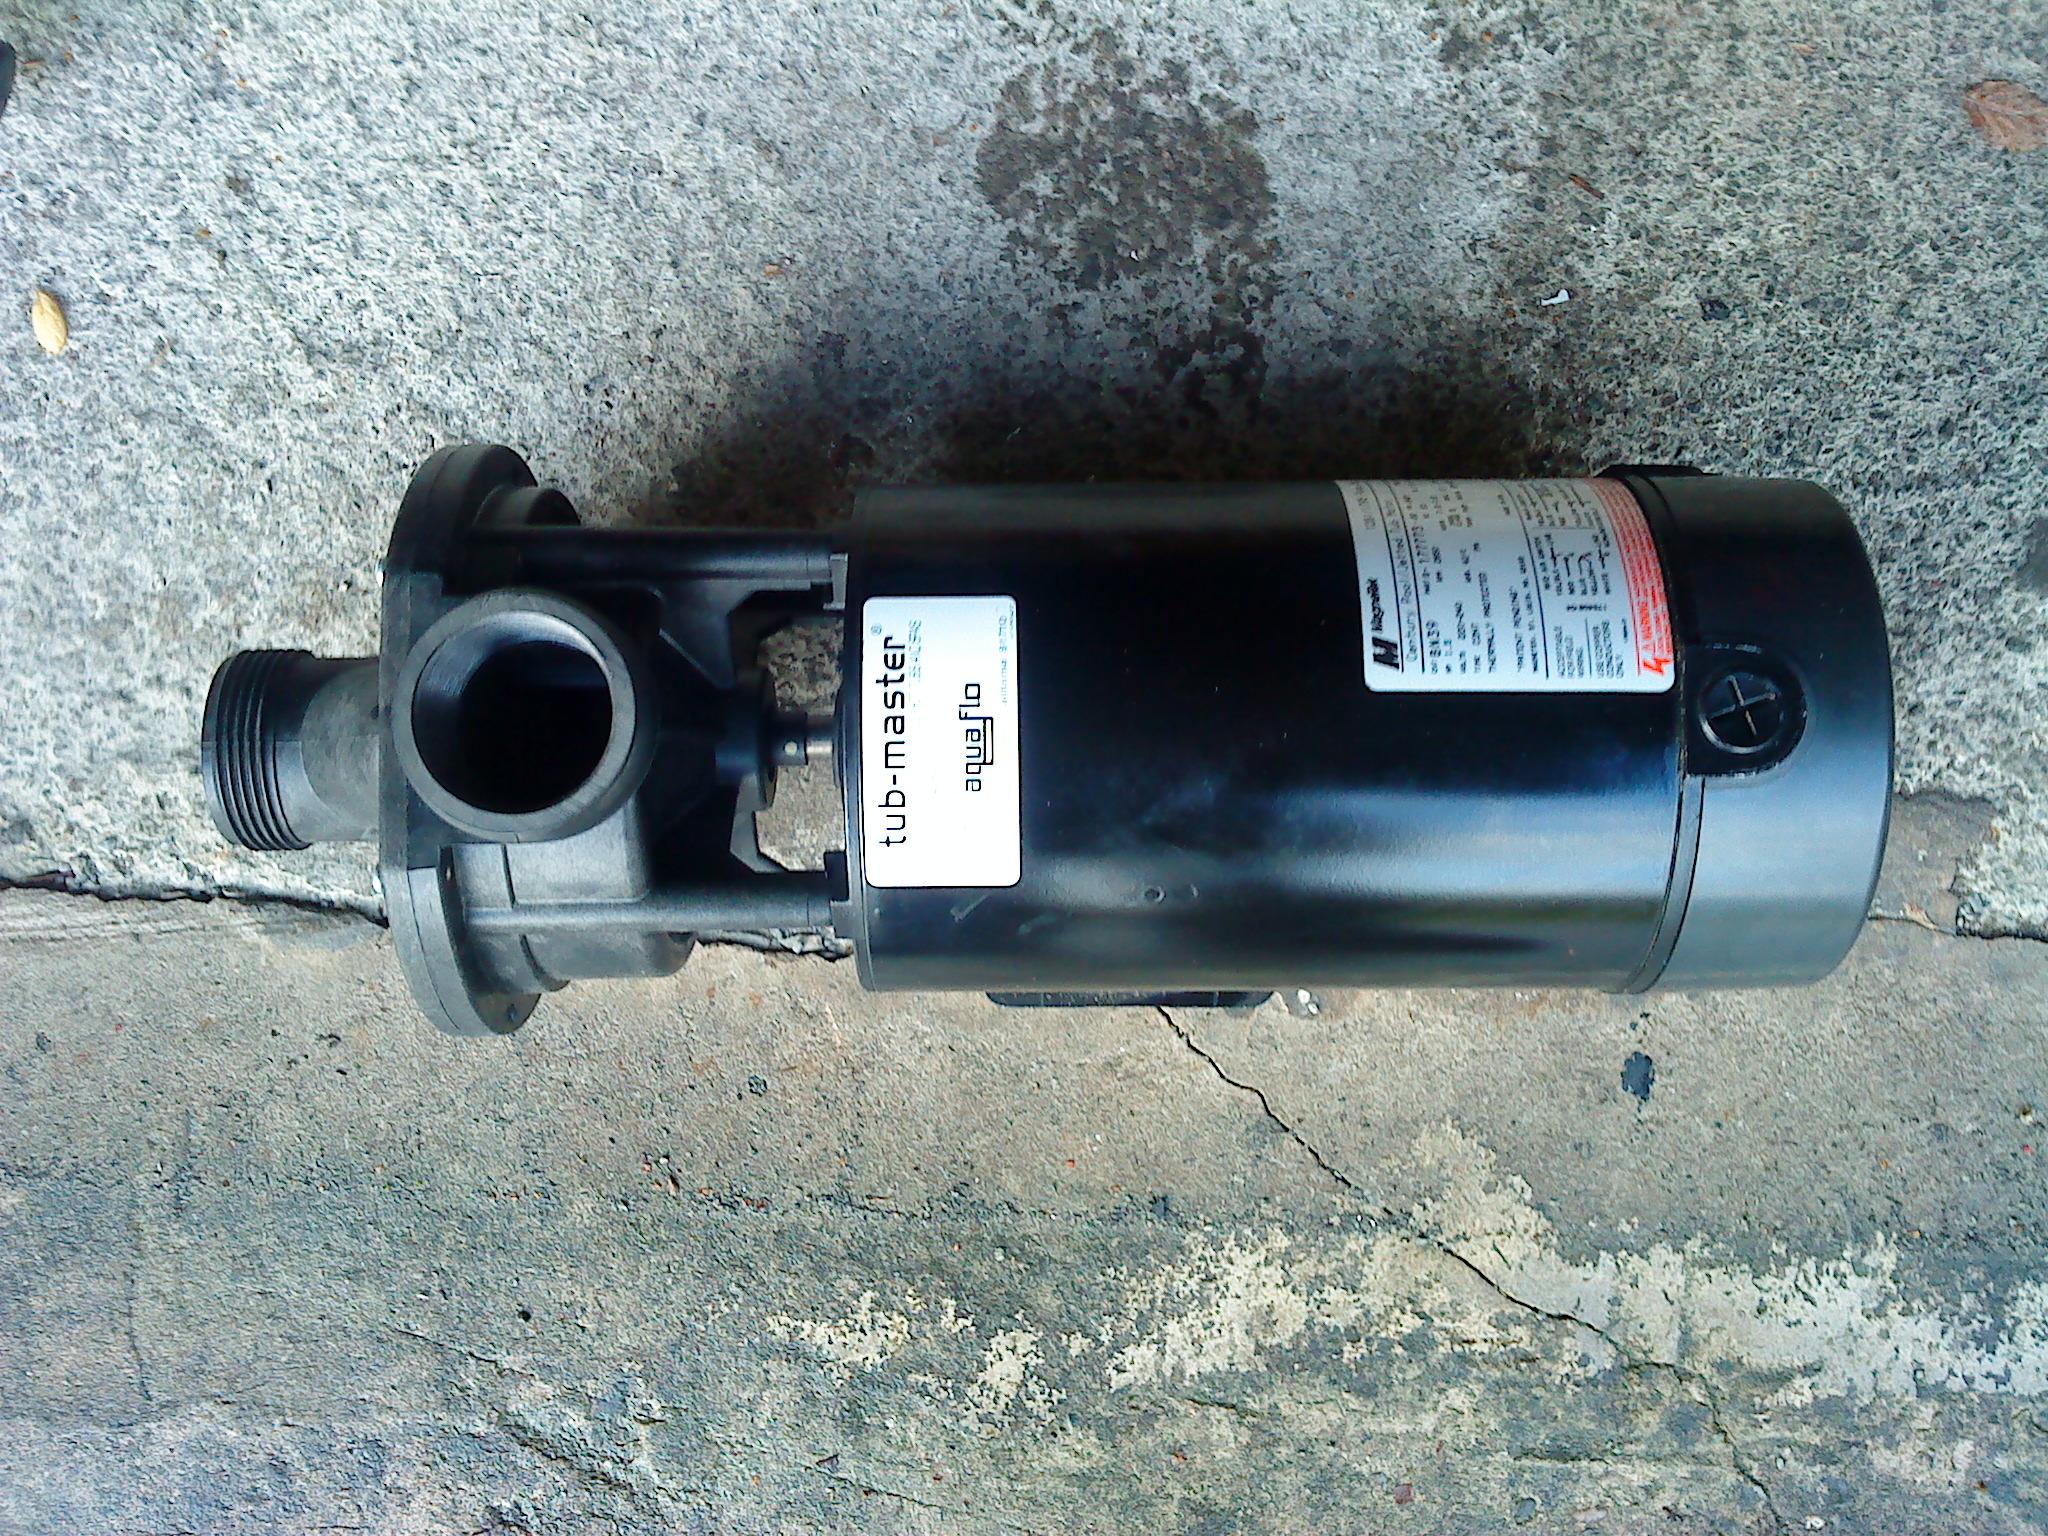 Aqua flo tub master century 1 5hp pool spa pump duty motor for Century pool spa motor